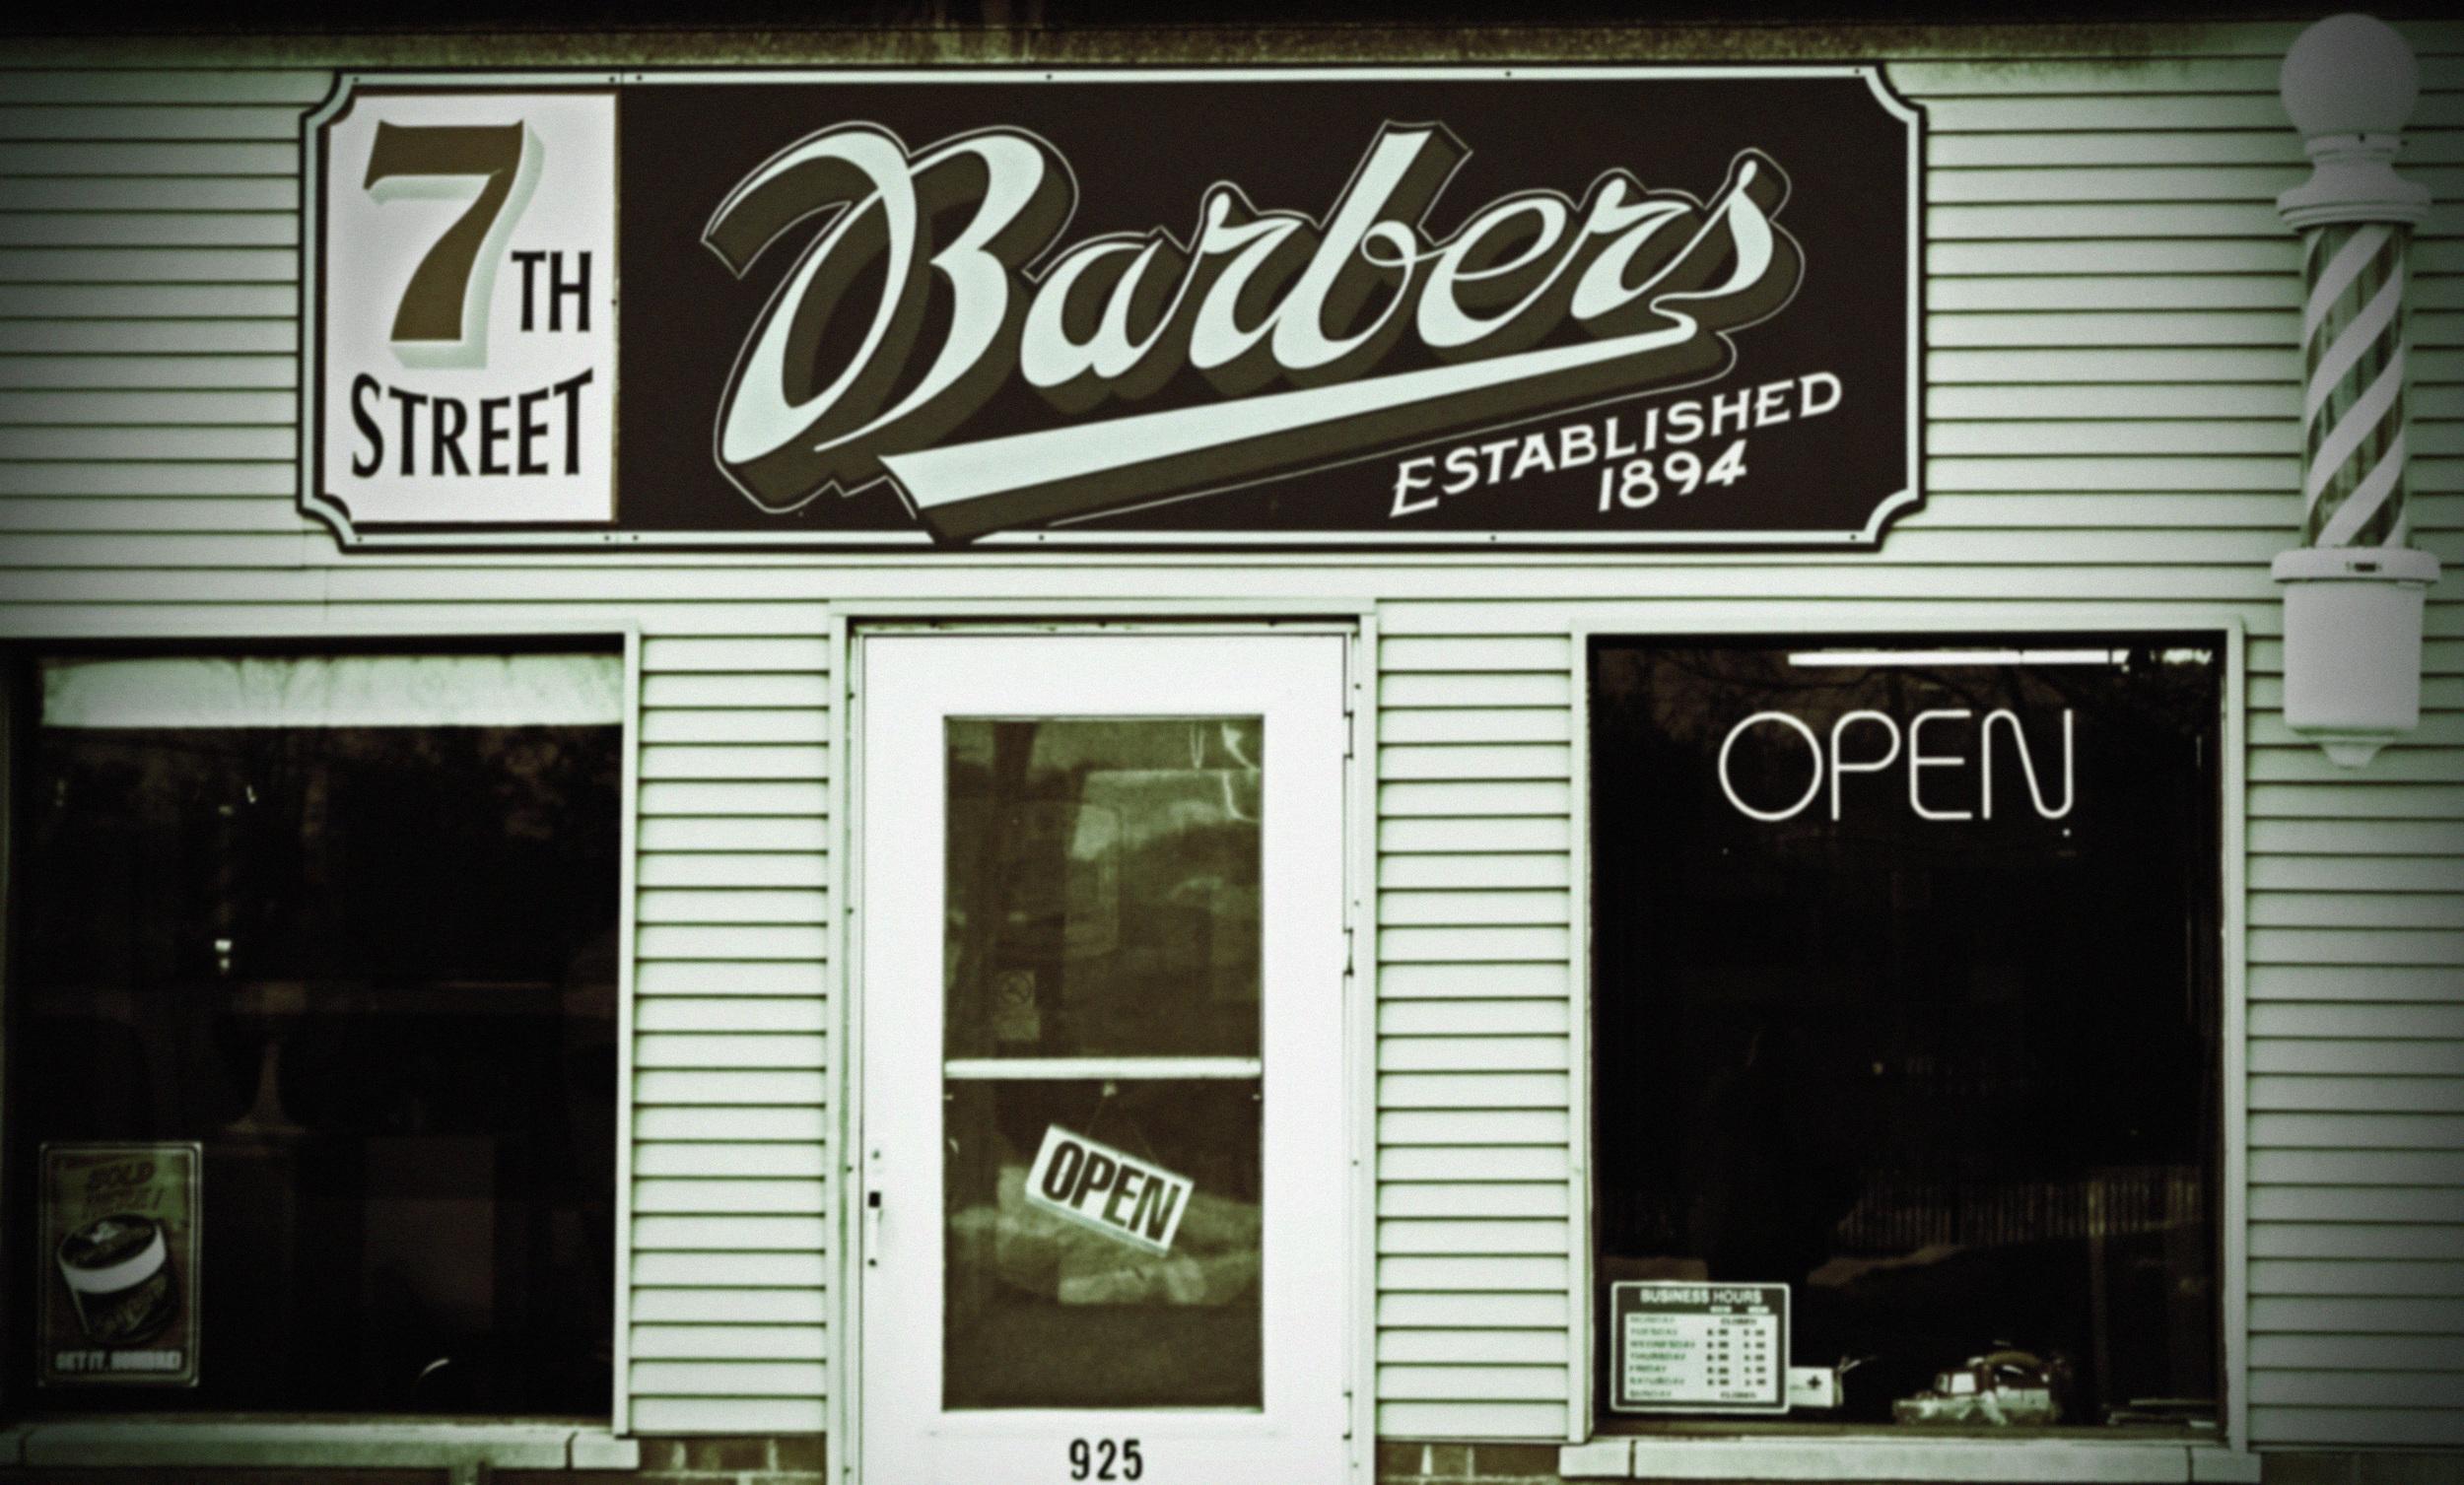 7th Street Barber.jpg